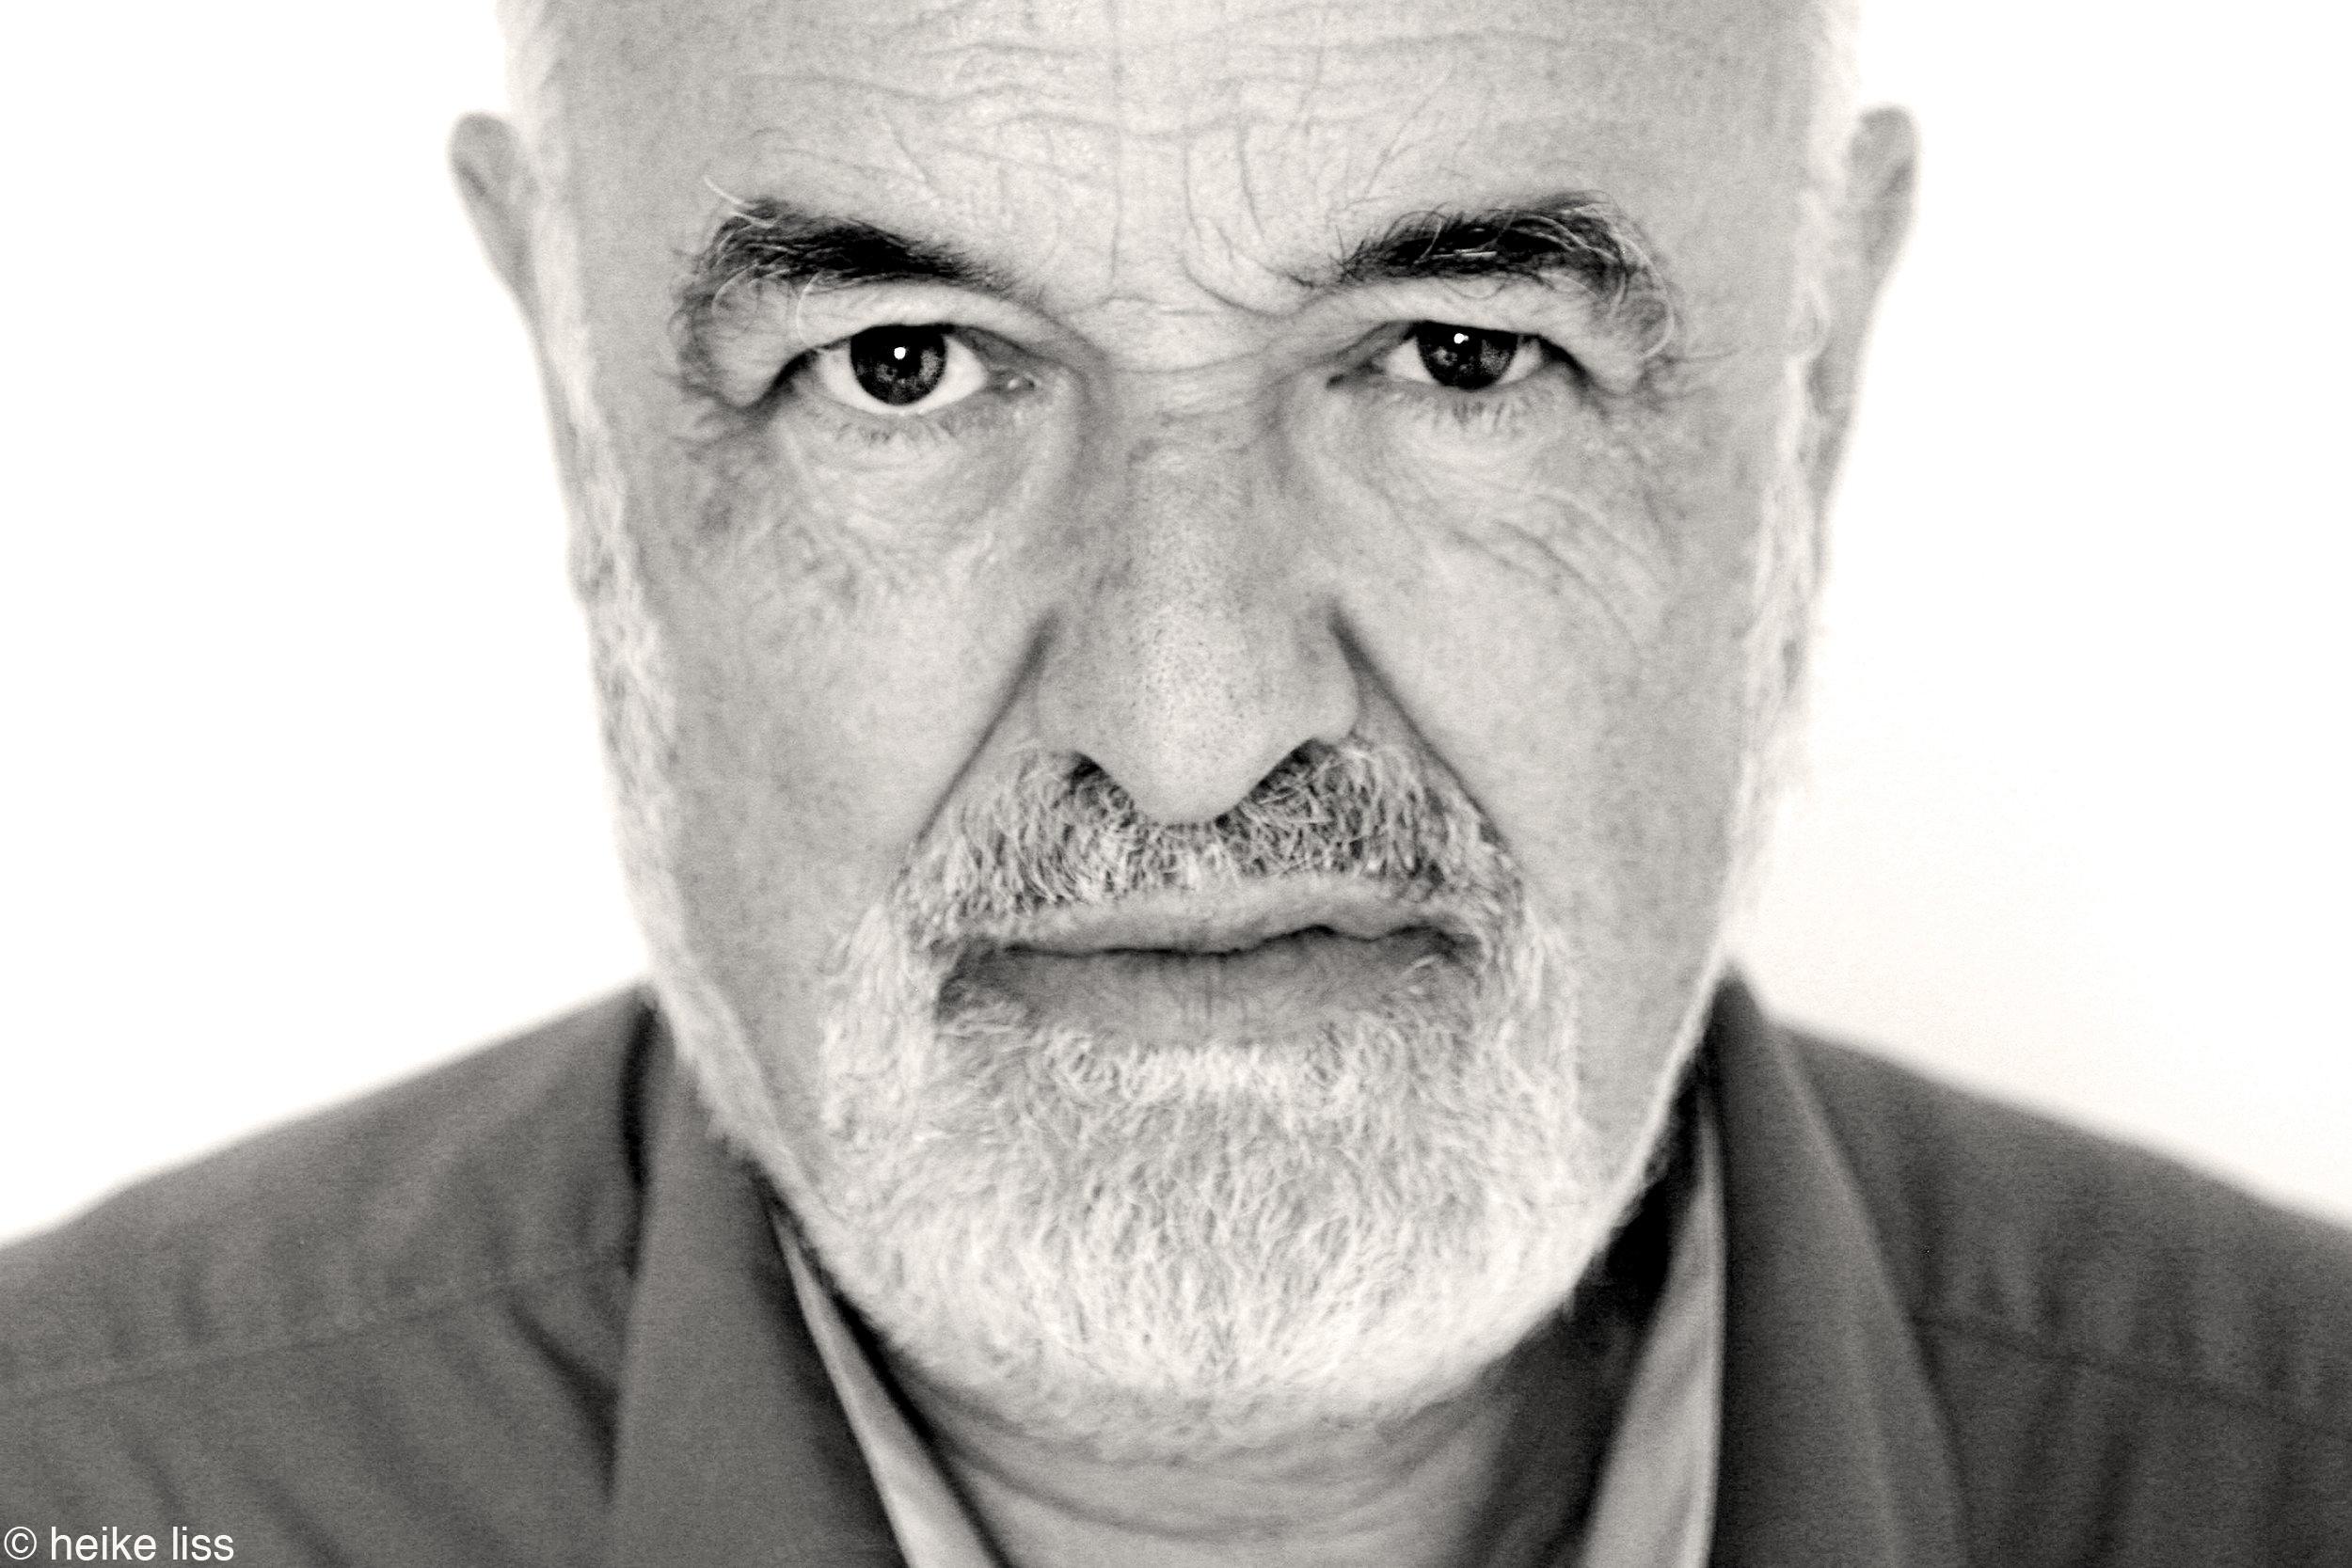 Dr. Christopher Frith, Neuroscientist © Heike Liss